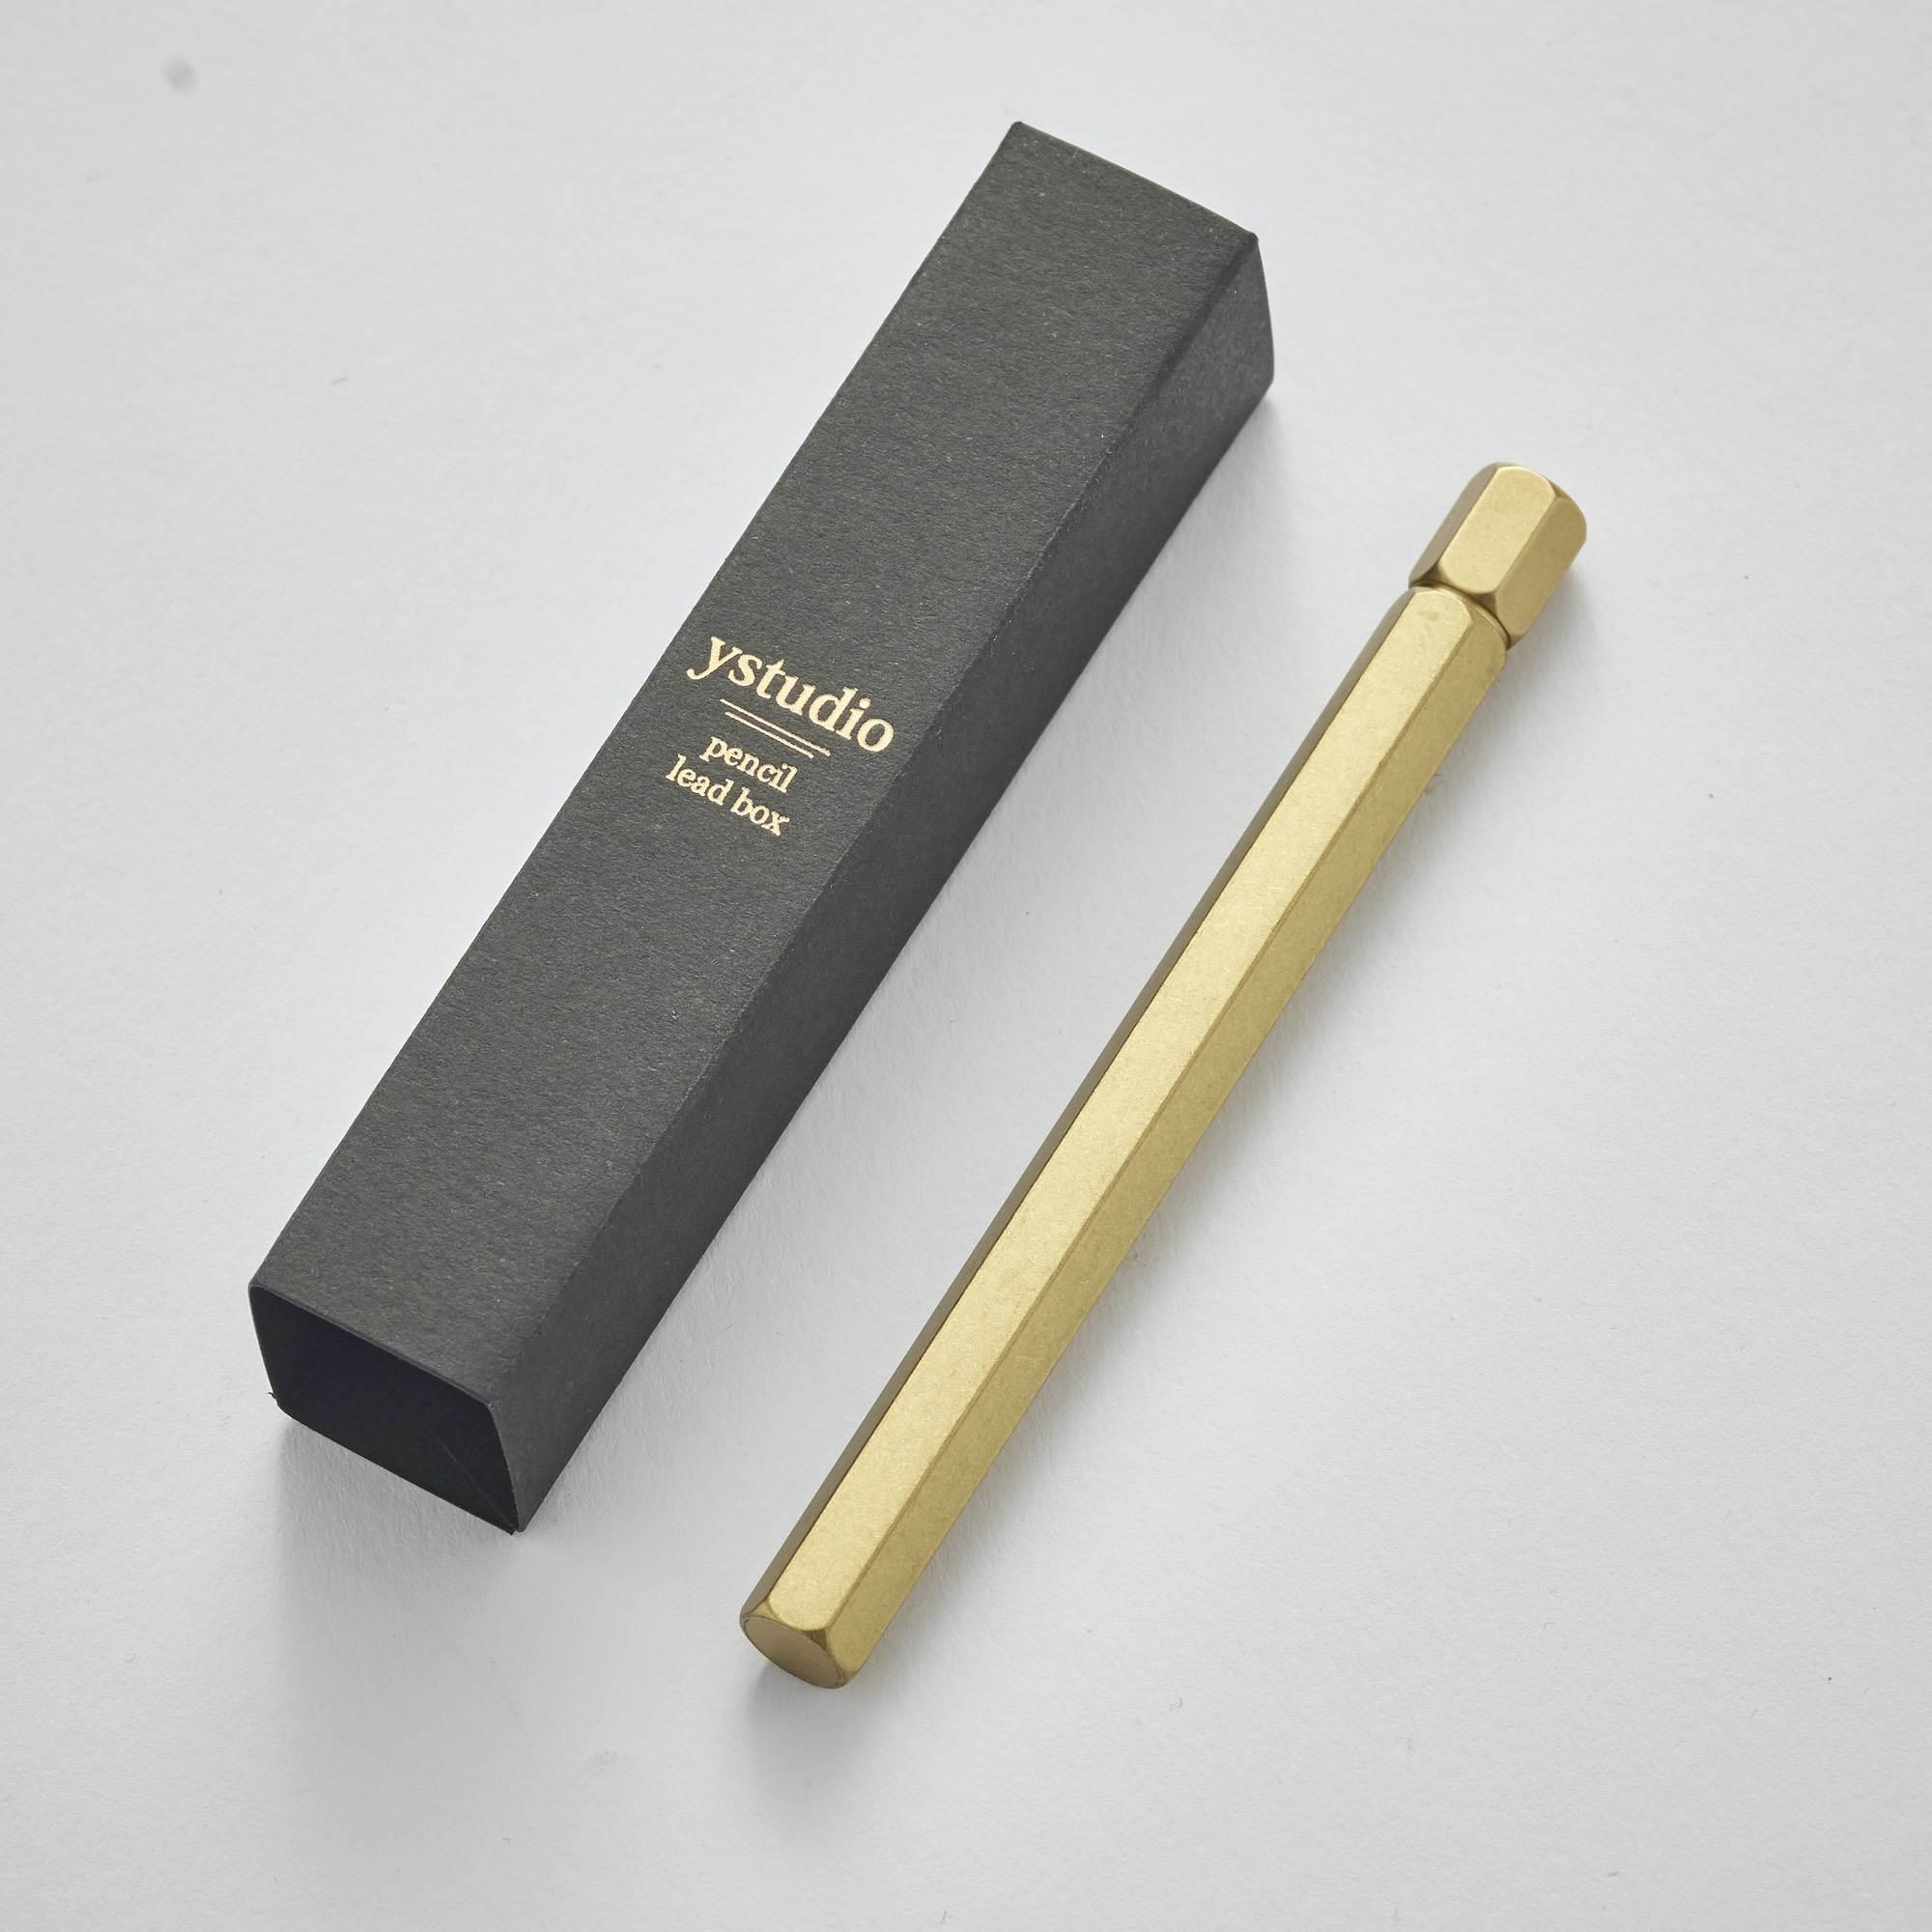 YStudio Чехол для грифелей Pencil Lead Box